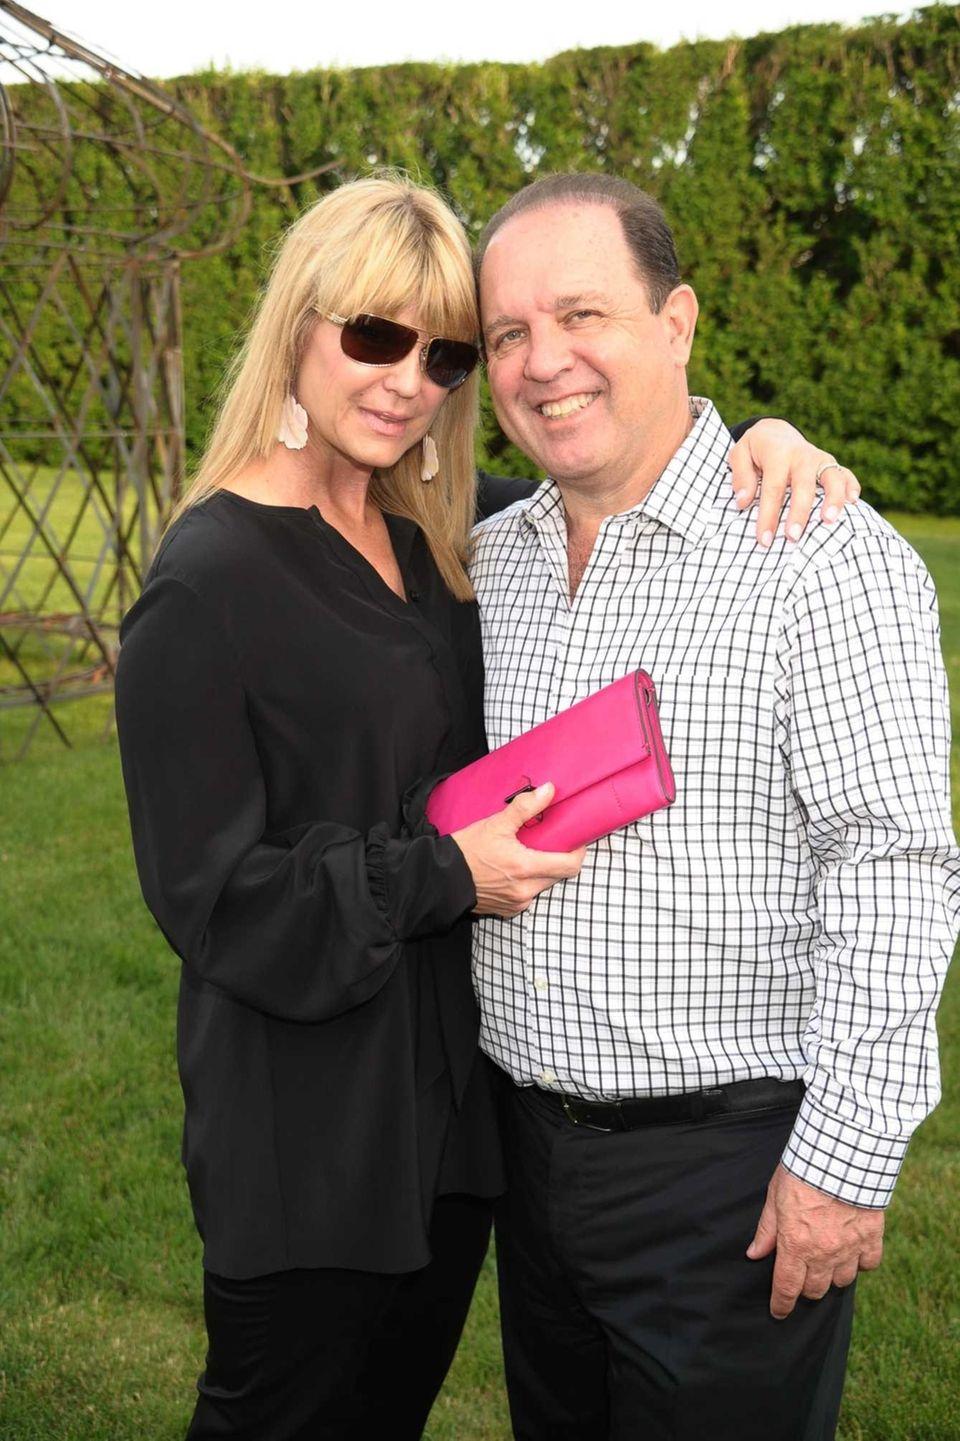 Marcy Warren and Michael Warren attend the